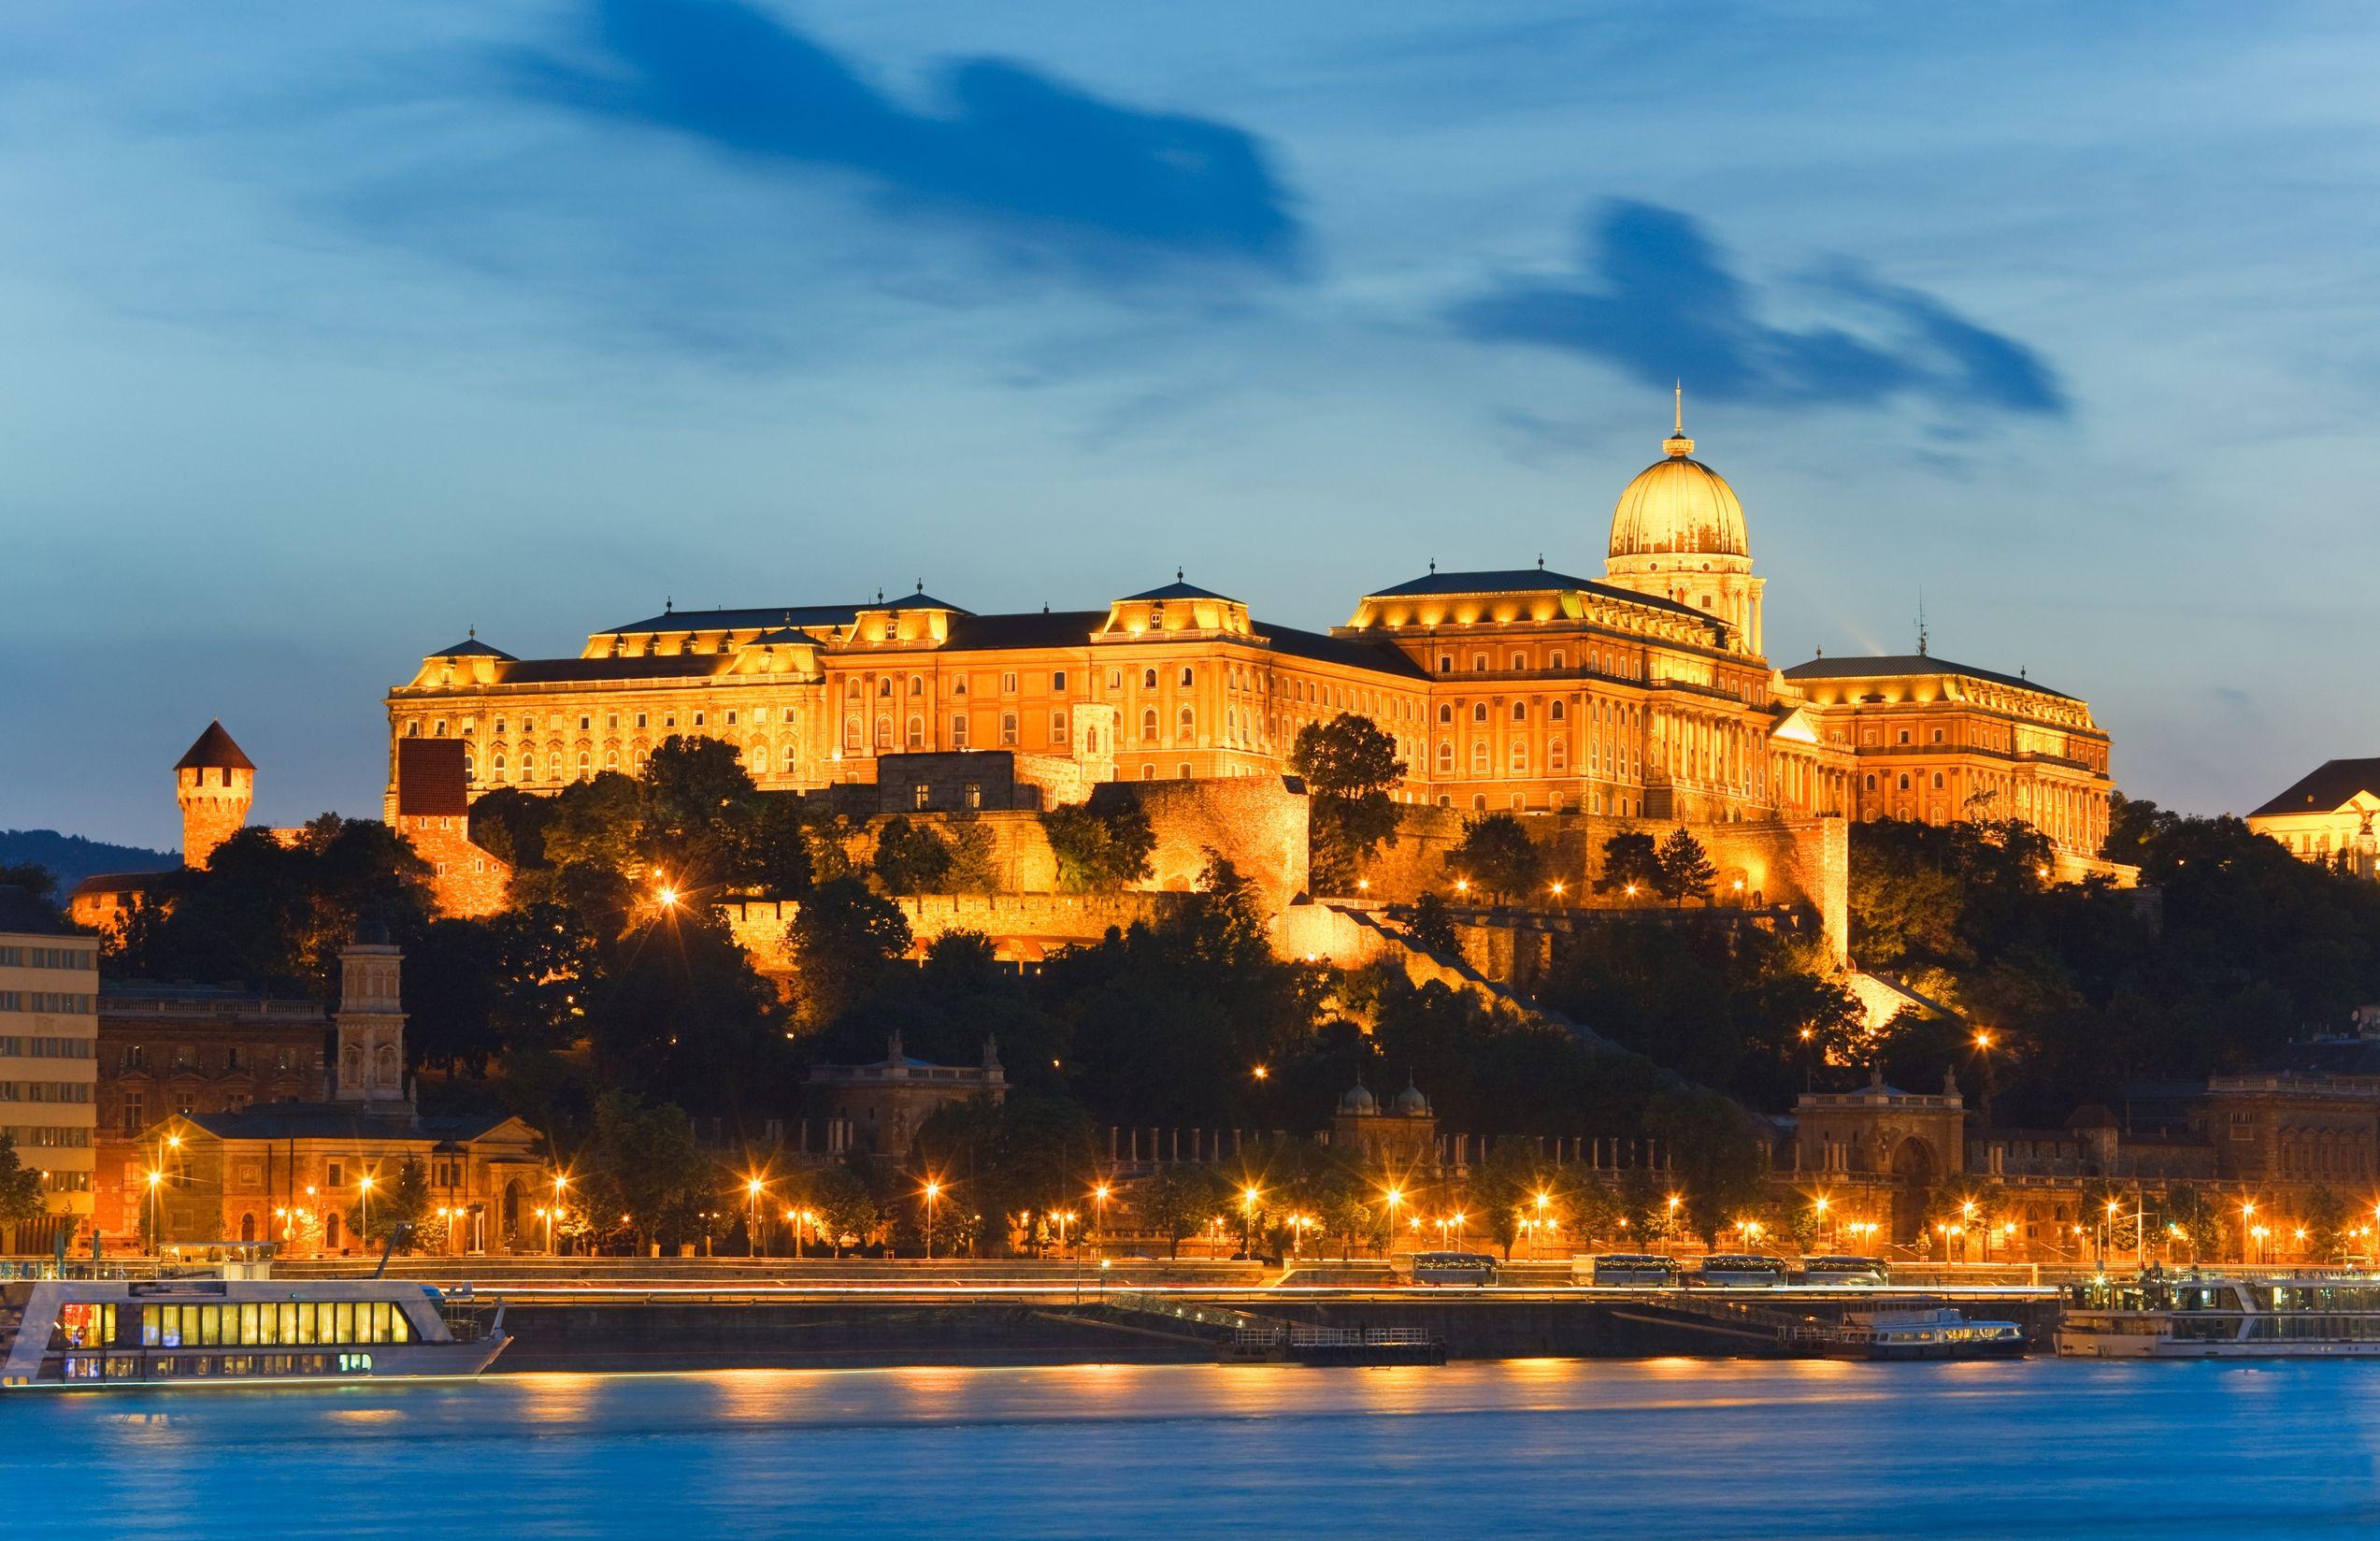 http://marinettedesign.do.am/Budapest/bpkepek/budapest-royal-palace_1434011195.jpg